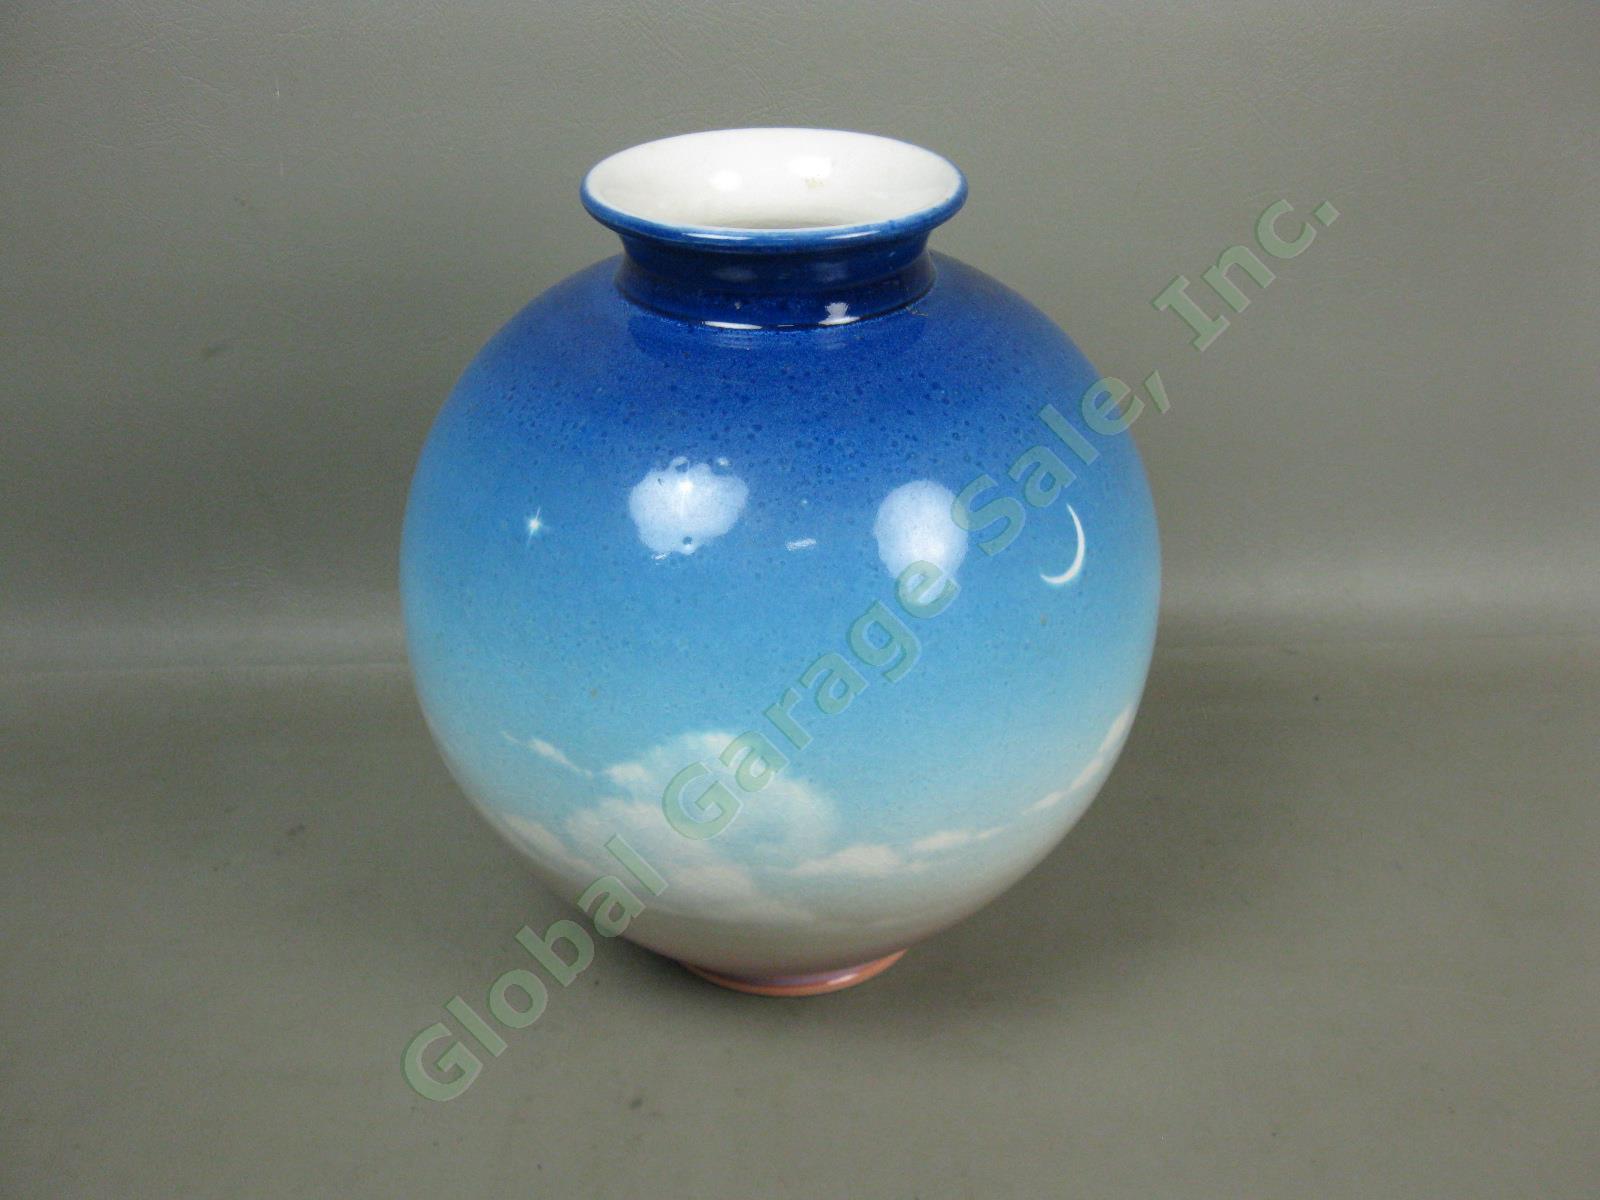 China Porcelain Sold By Global Garage Sale